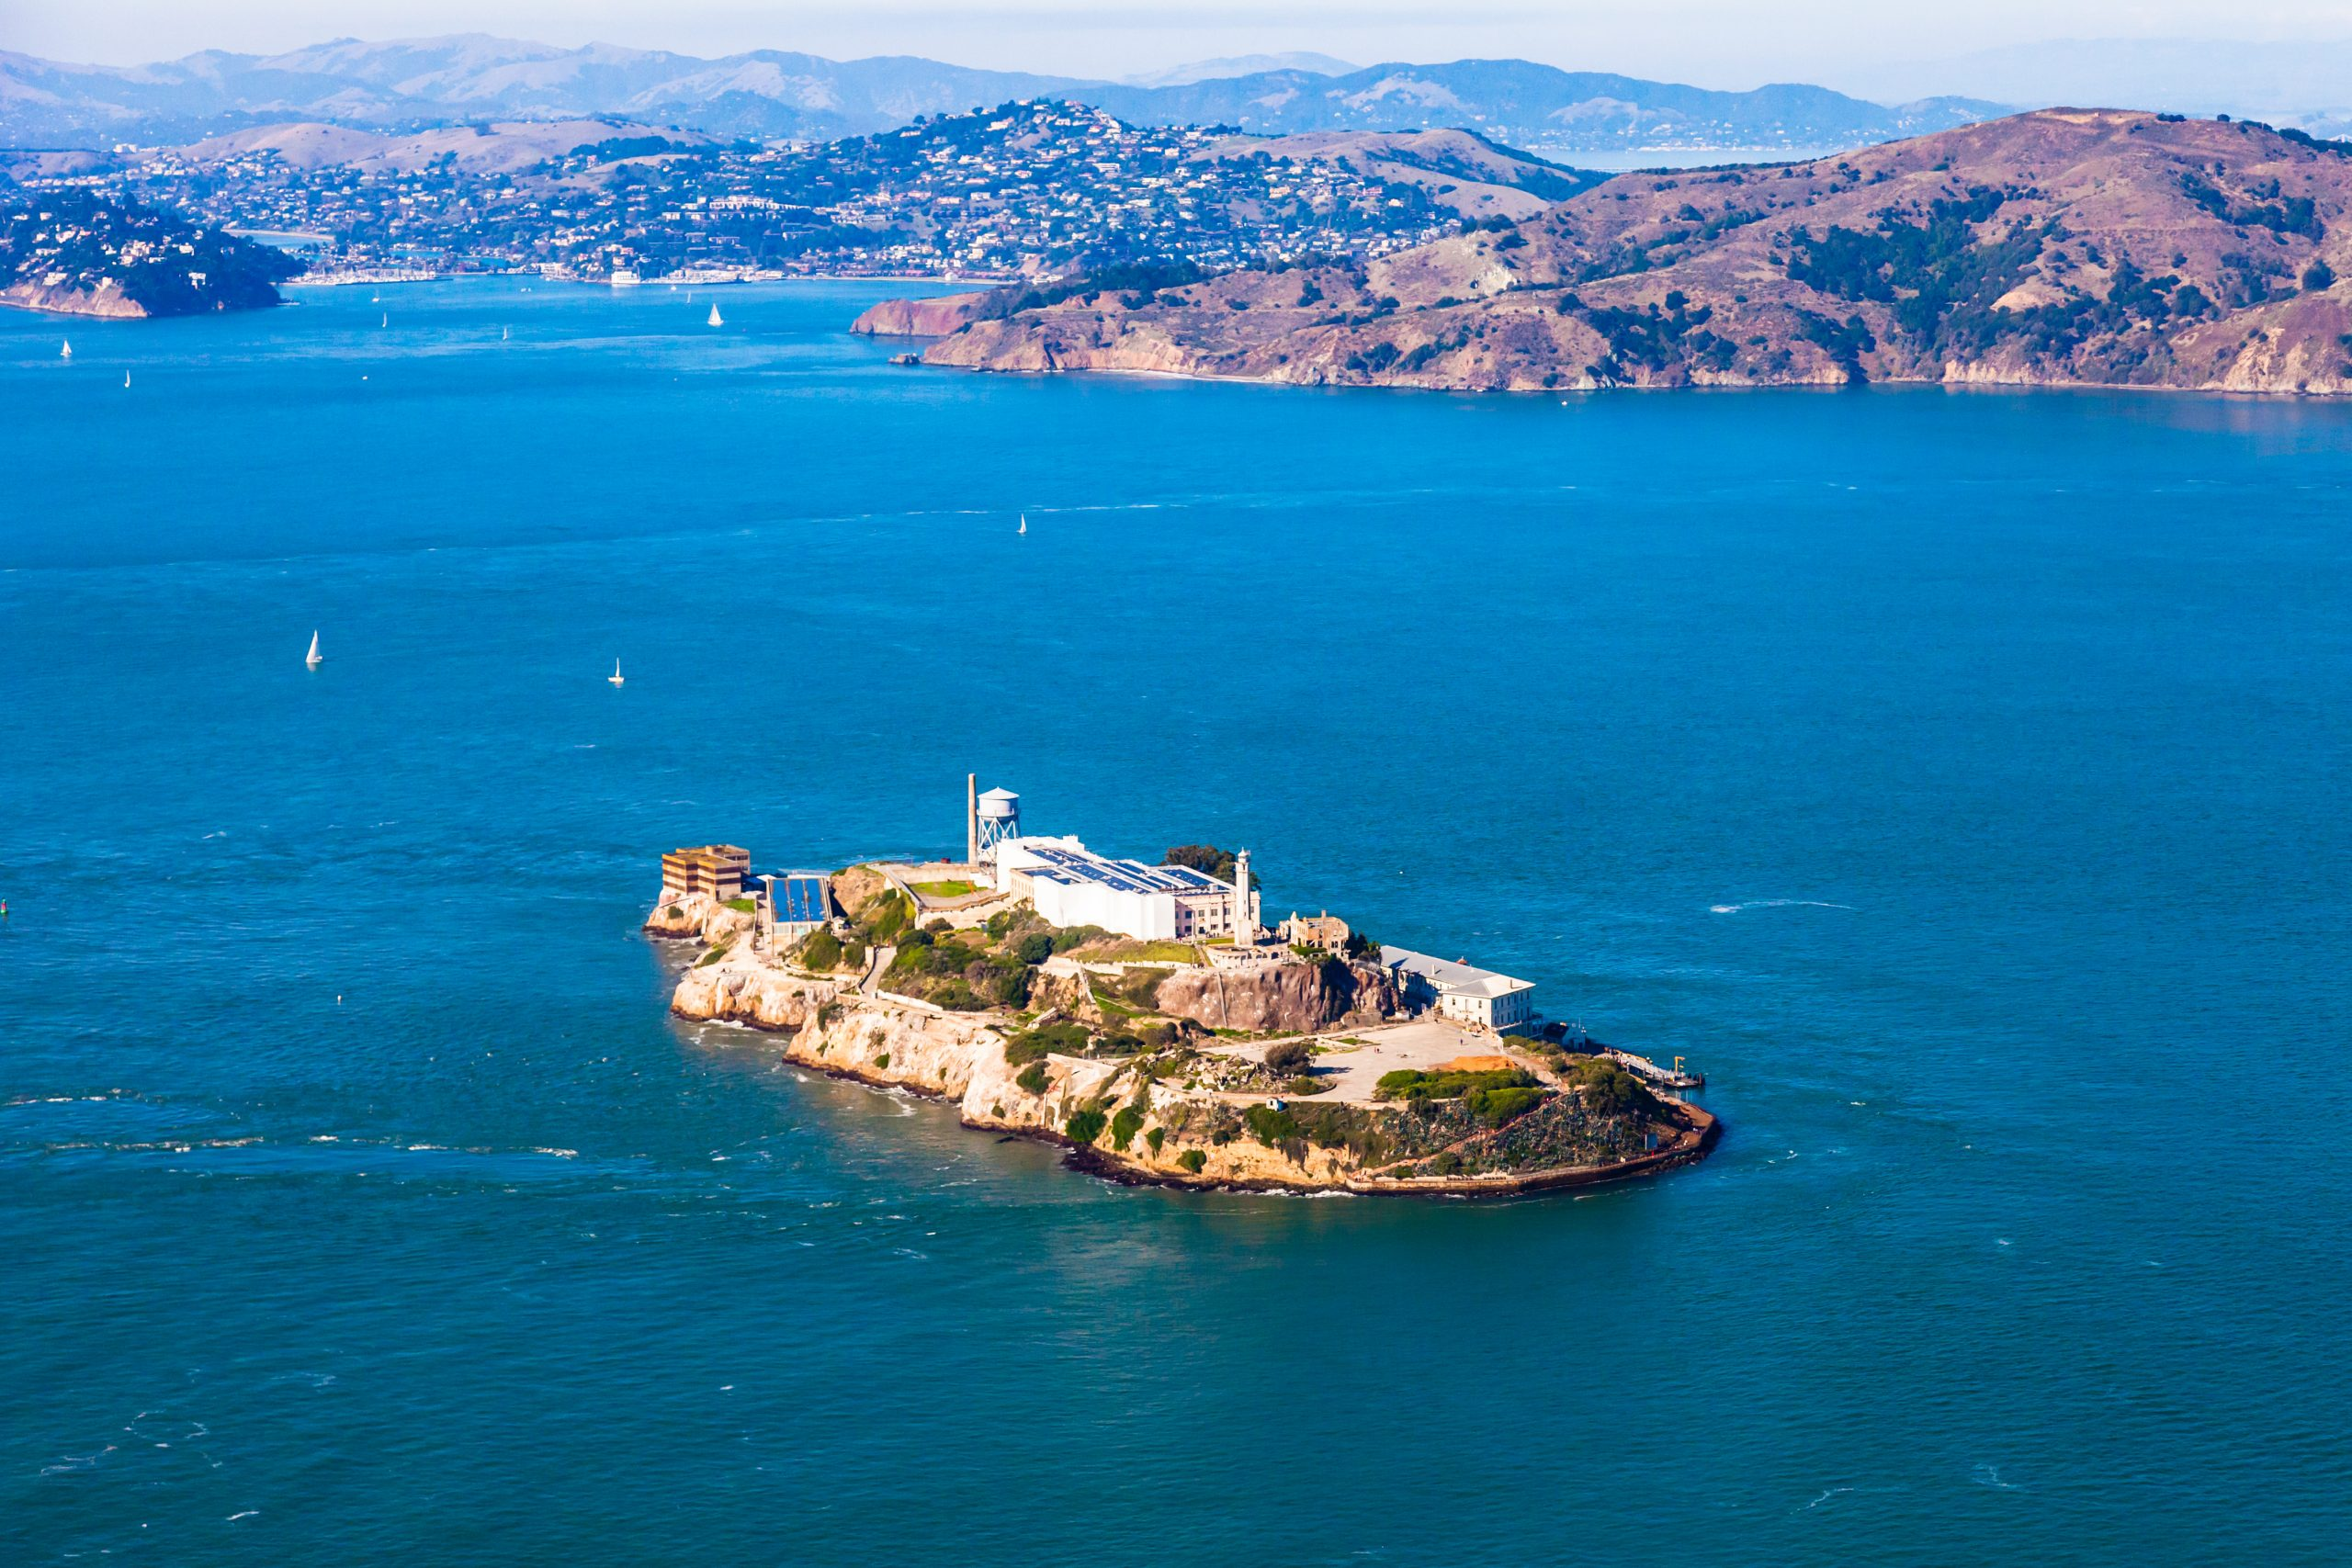 alcatraz (Foto: Nickolay Stanev)